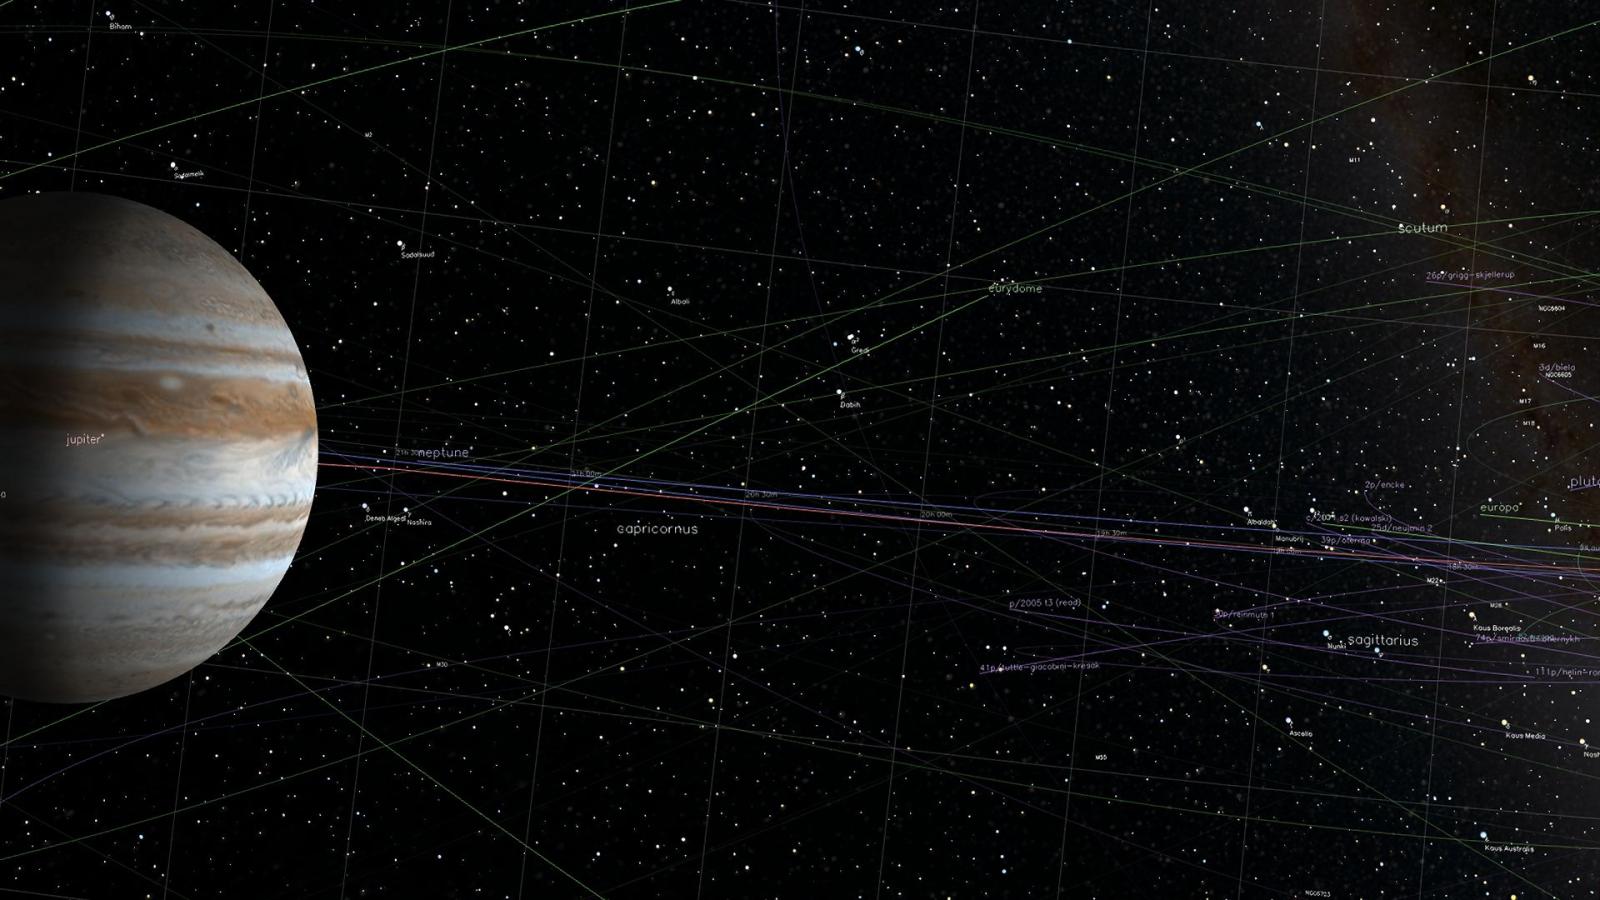 Free Download Star Wars Dual Screen Wallpaper 3840x1080 3840x1080 For Your Desktop Mobile Tablet Explore 47 Dual Screen Wallpaper Star Wars Panoramic Wallpaper Dual Screen Windows 10 Free Panoramic